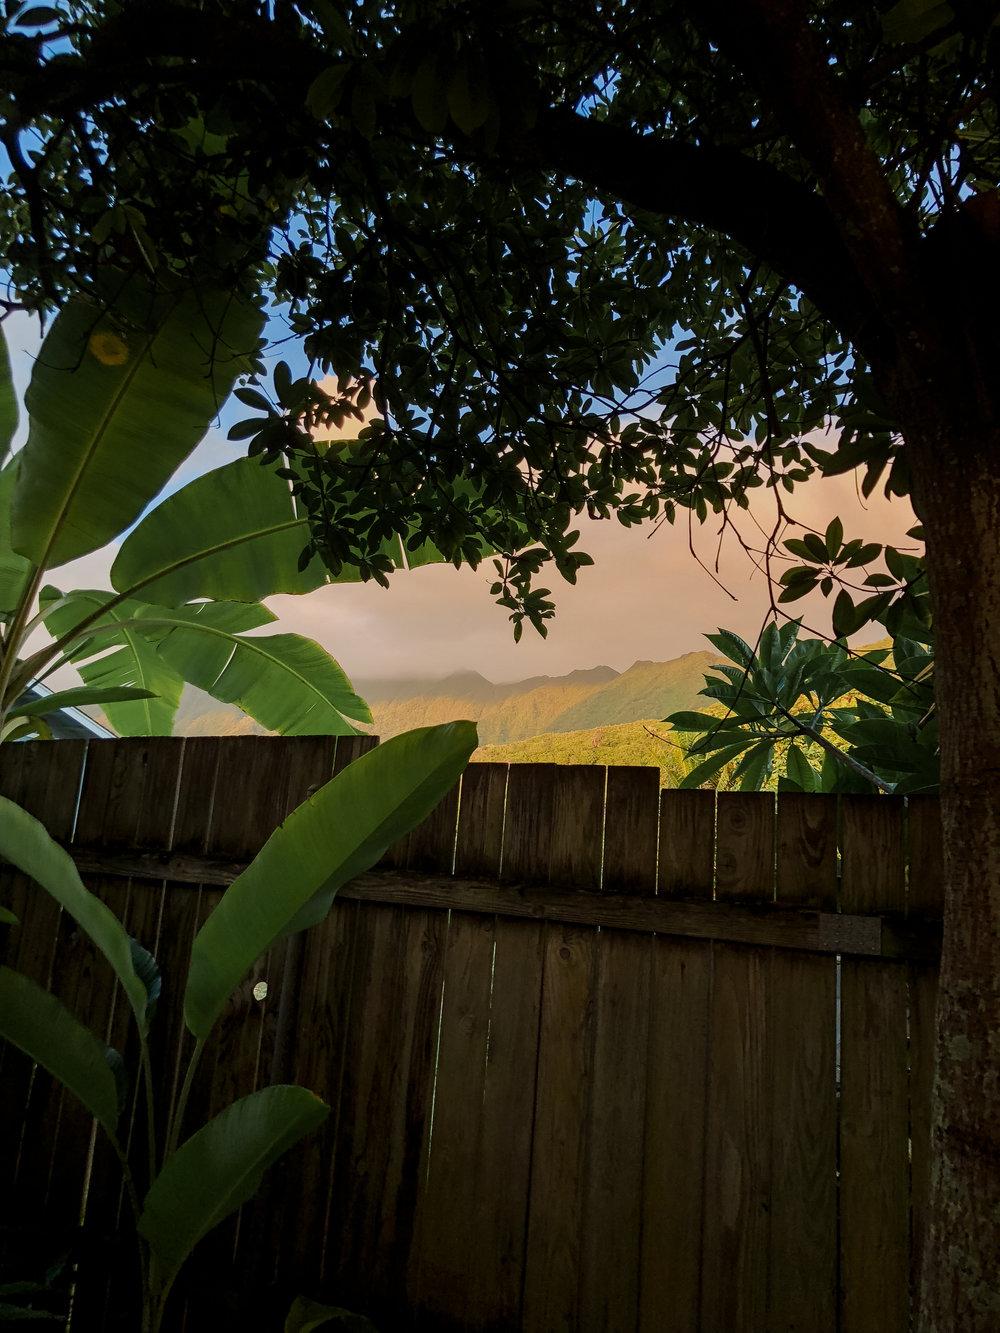 meagans hawaii pics-19.jpg